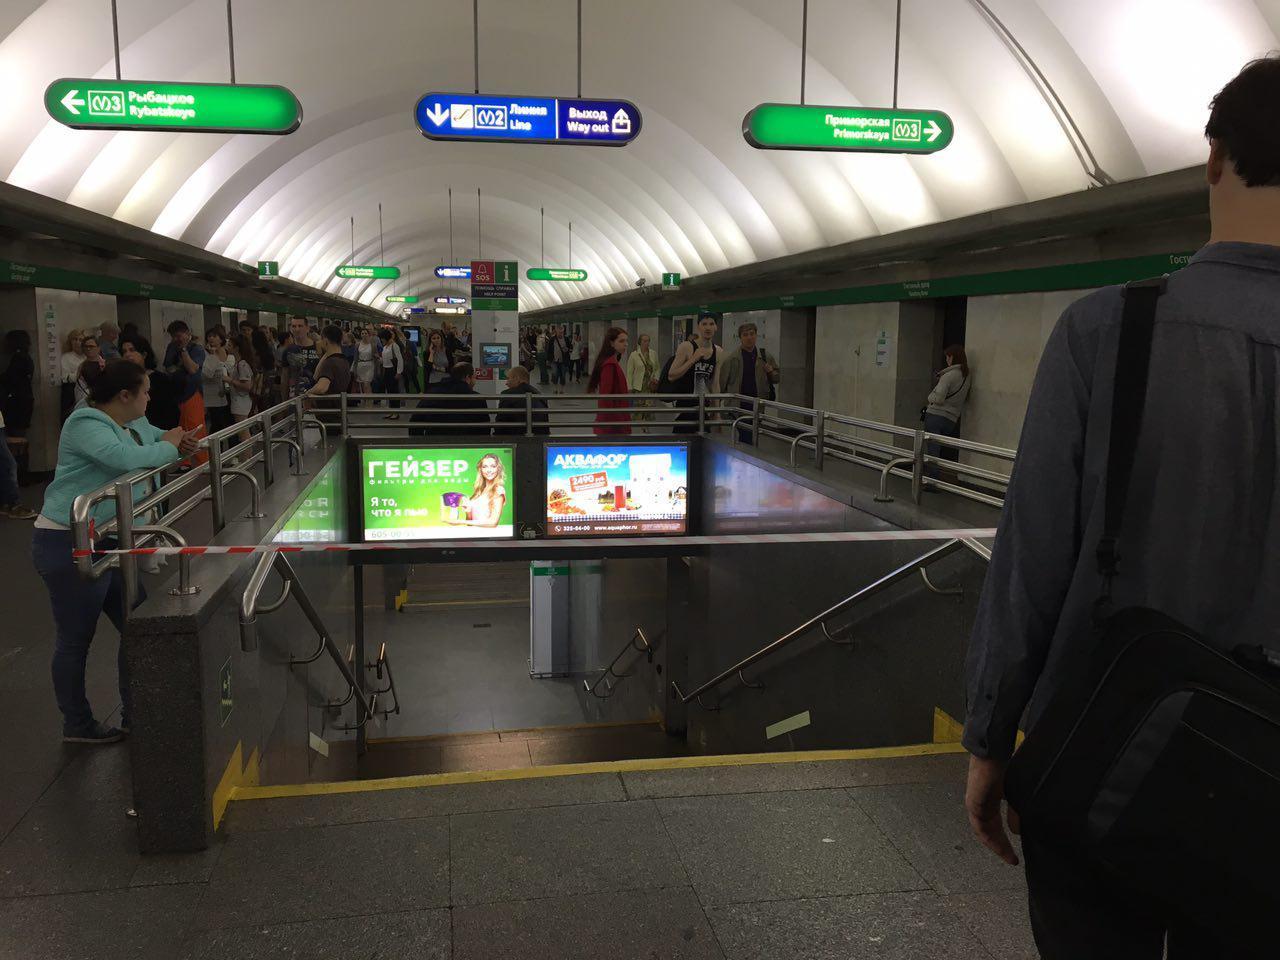 Интим услуги станция метро Невский Проспект спб шлюхи питера индивидуалки м в Санкт-Петербурге